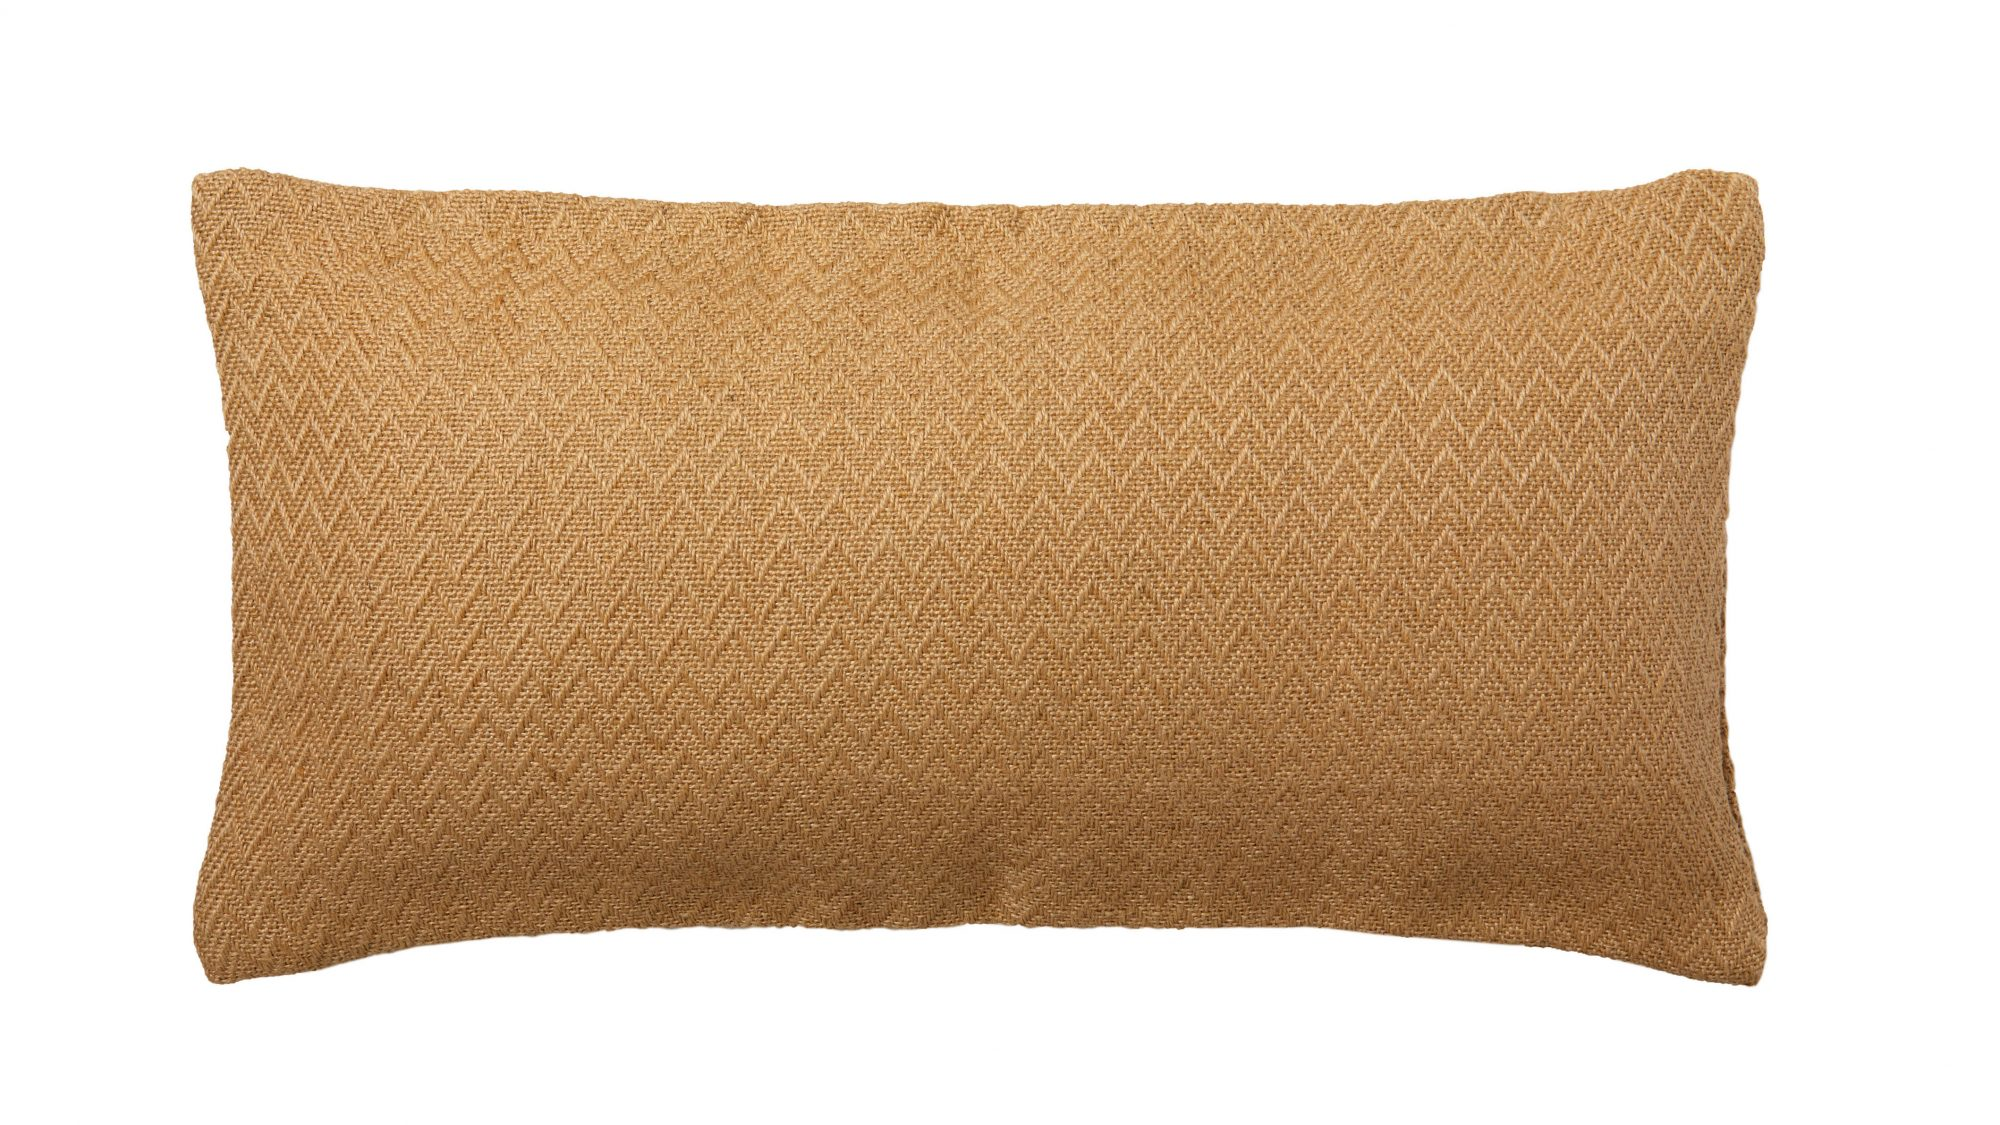 Rachael Ray Home Flat Iron Jute Pillow